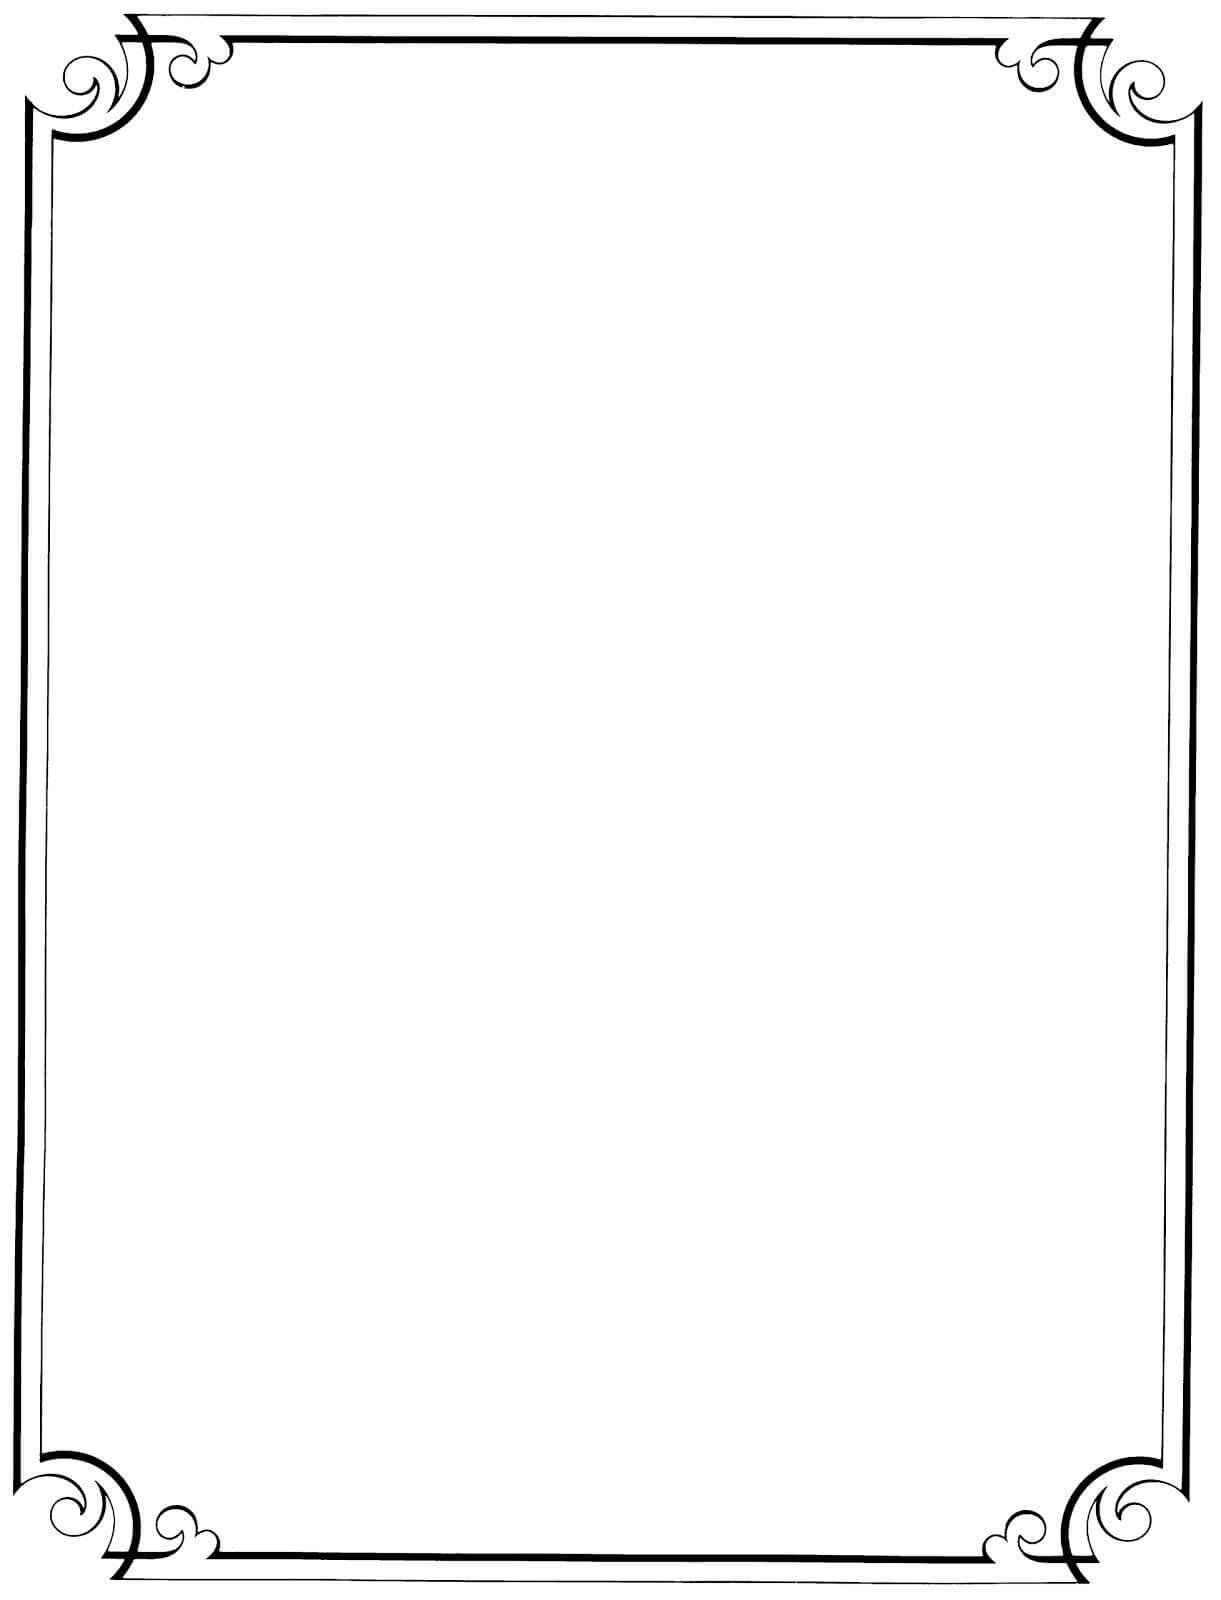 Pinrhea Shrestha On Drawings | Calligraphy Borders Regarding Word Border Templates Free Download